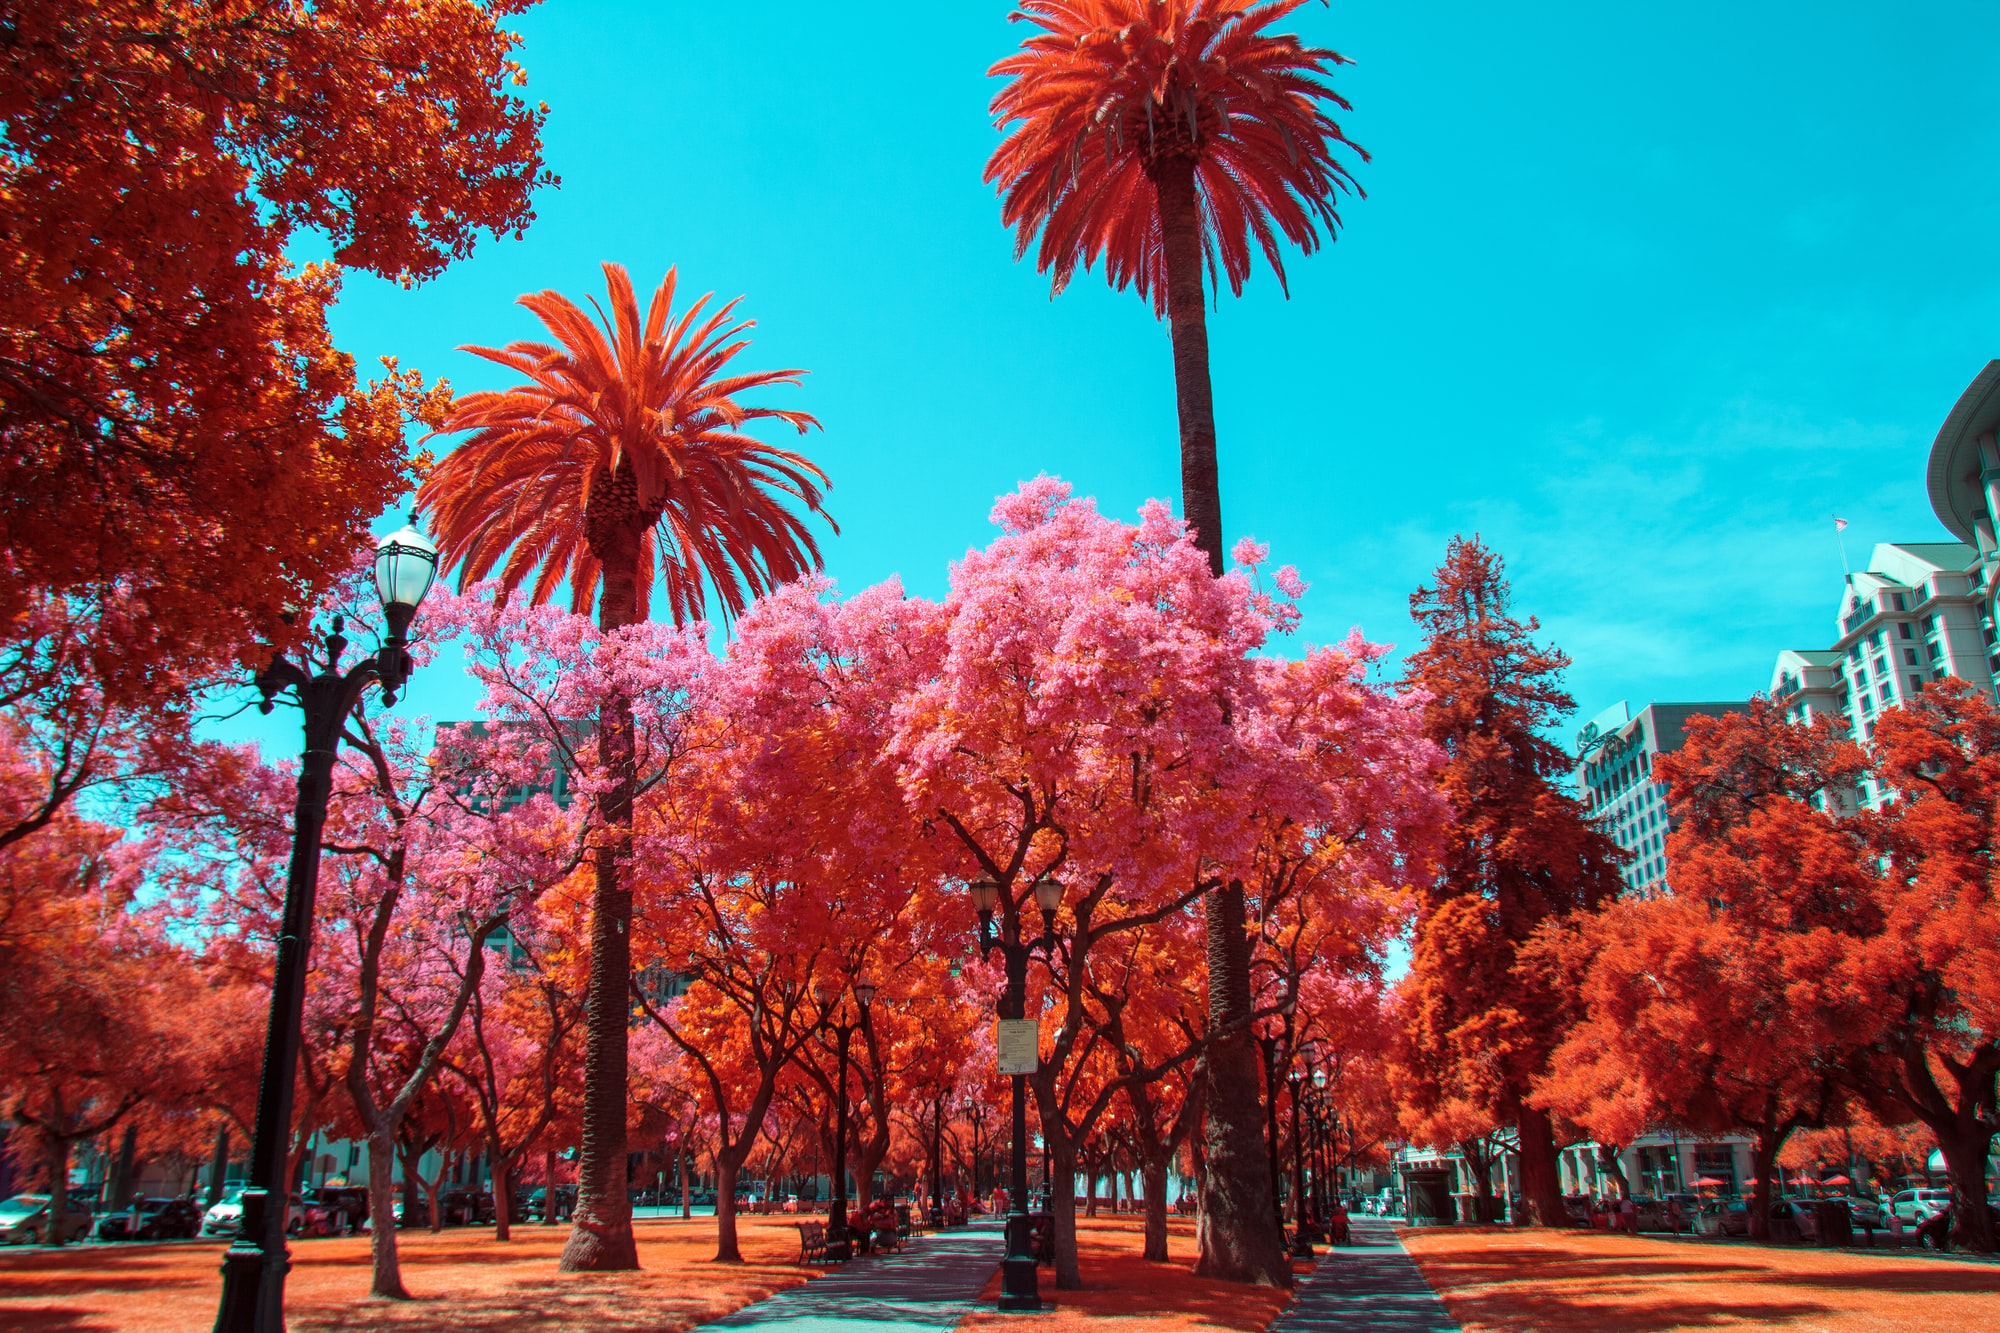 San Jose, CA Canon 550d FullSpectrum IRChrome